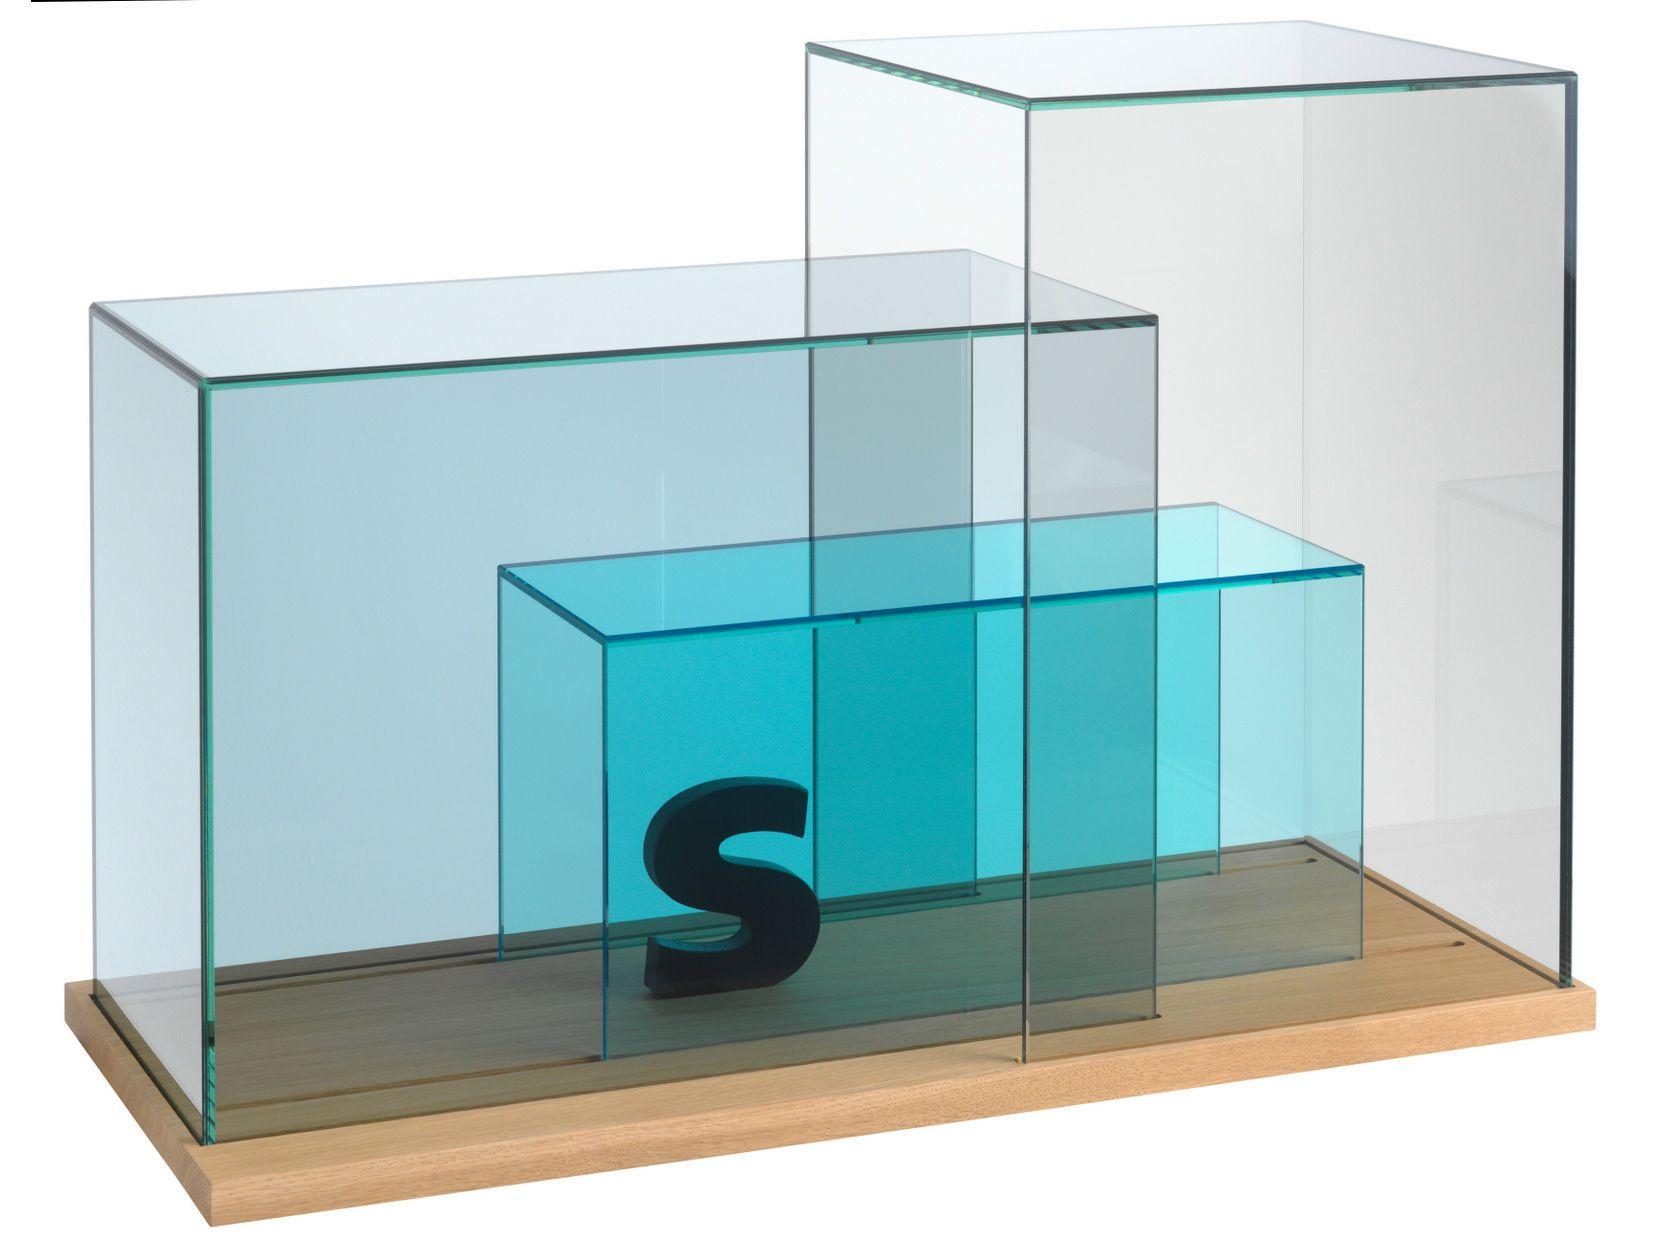 Meuble de rangement en verre show case by sch nbuch design nikolaus kayser b ttcher henssler - Meuble rangement verre ...